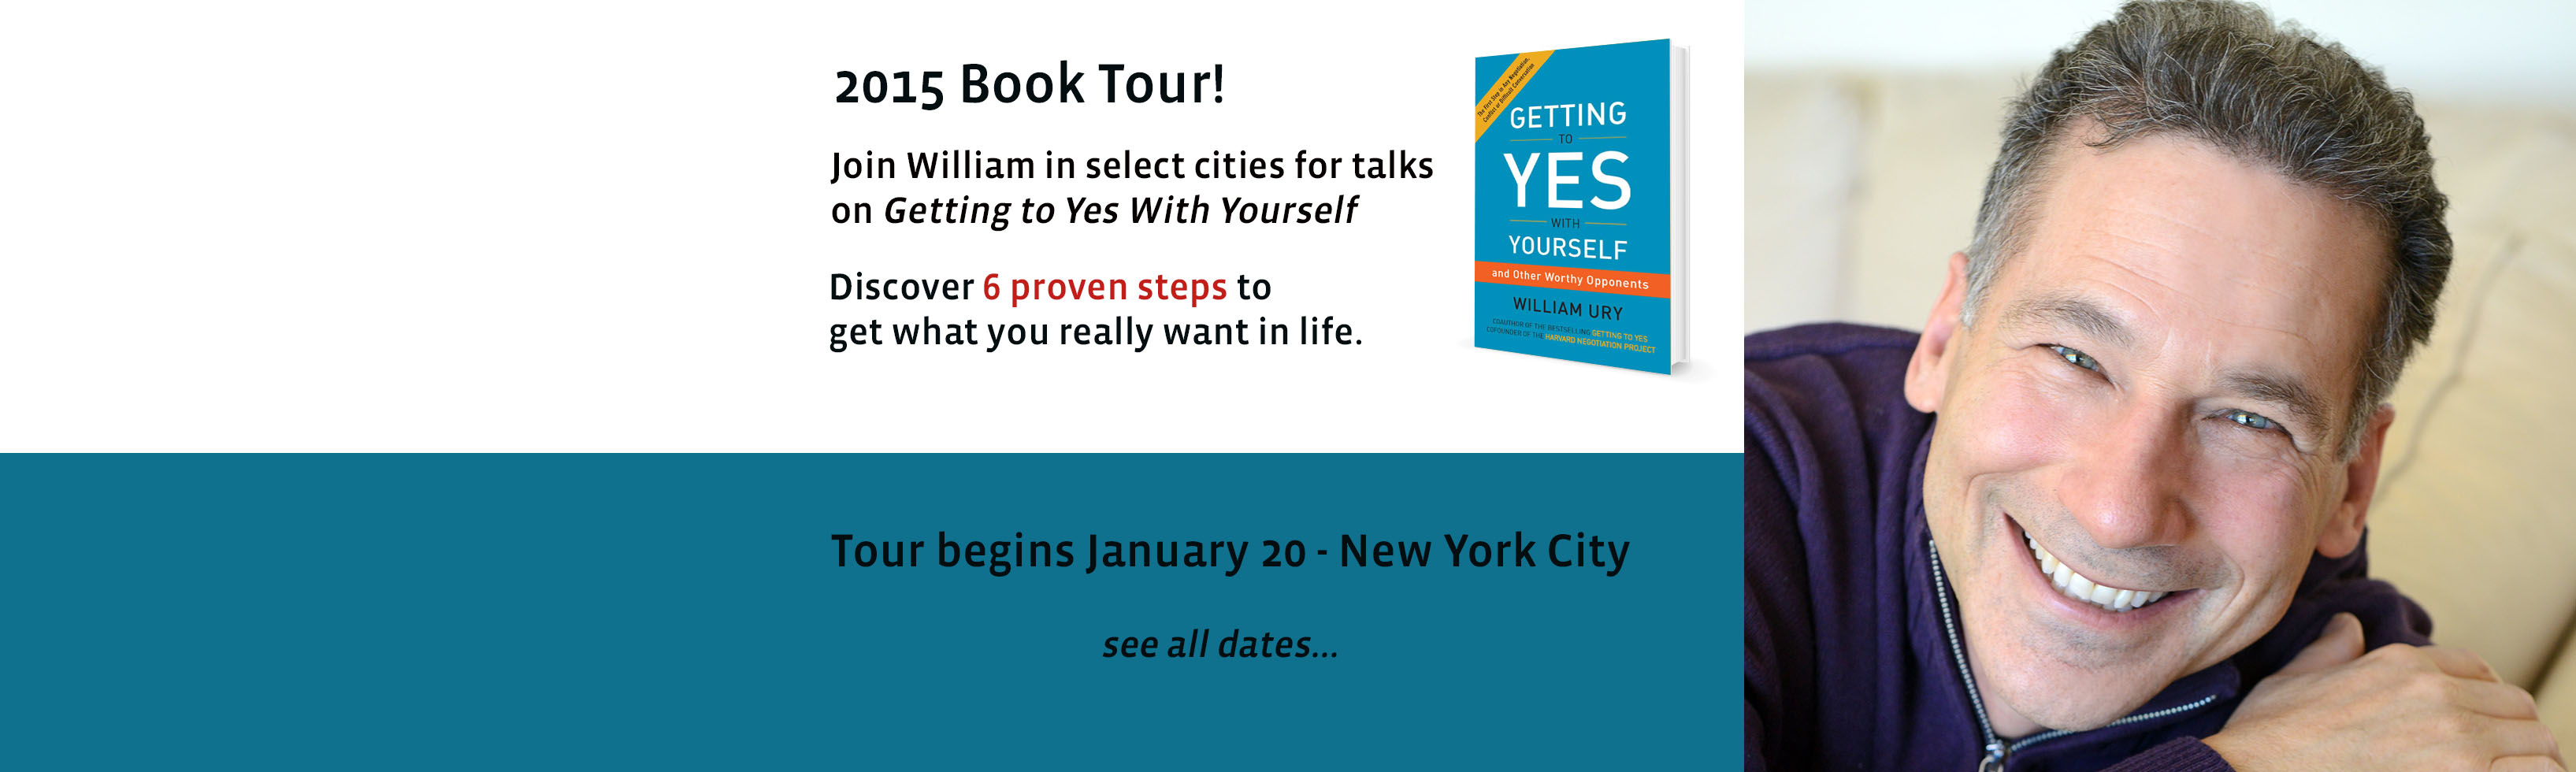 Book-Tour-Slider1